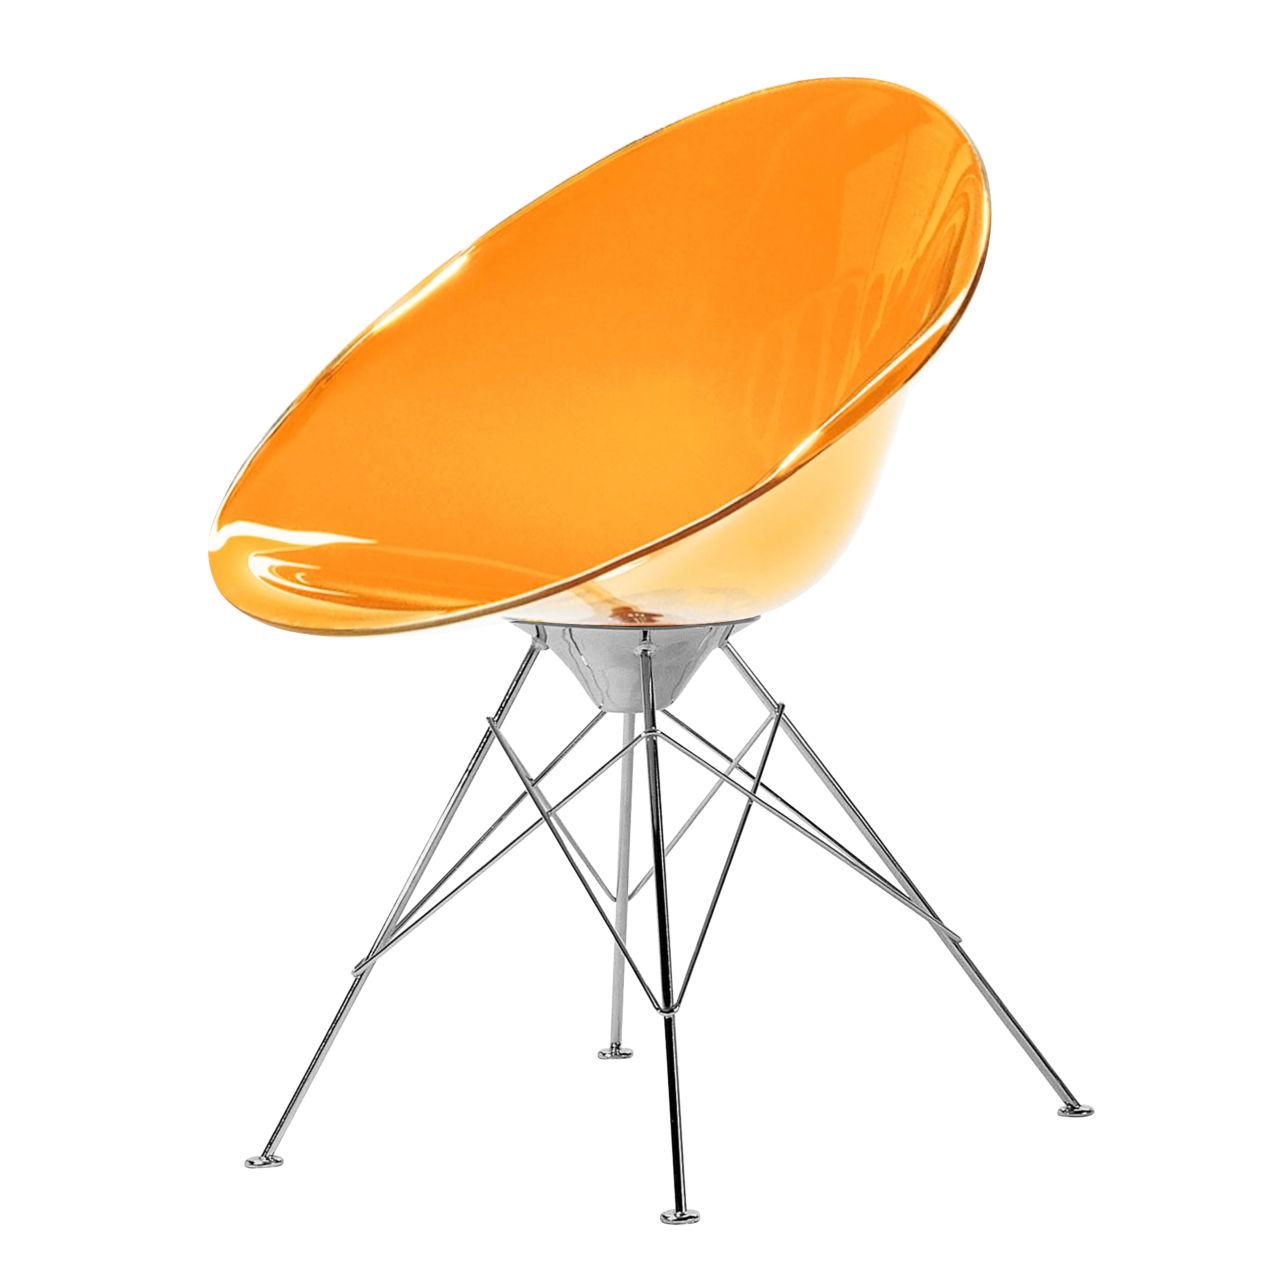 Ero S Chair in Orange by Kartell